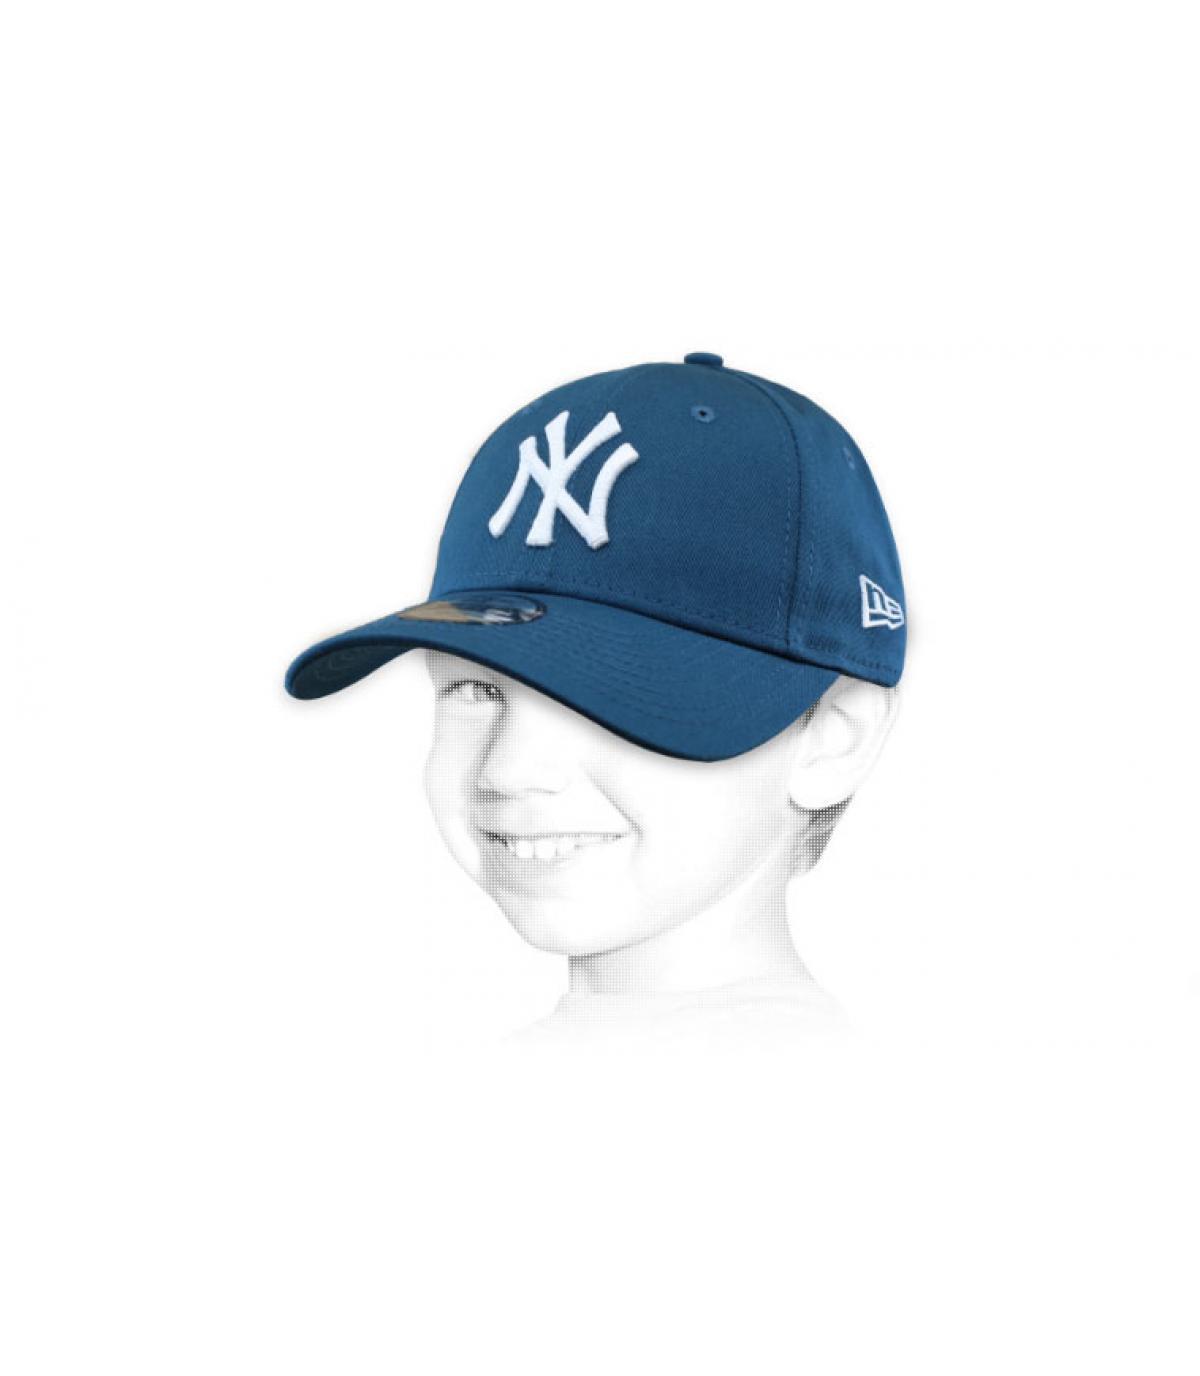 Kinder Cap blau NY